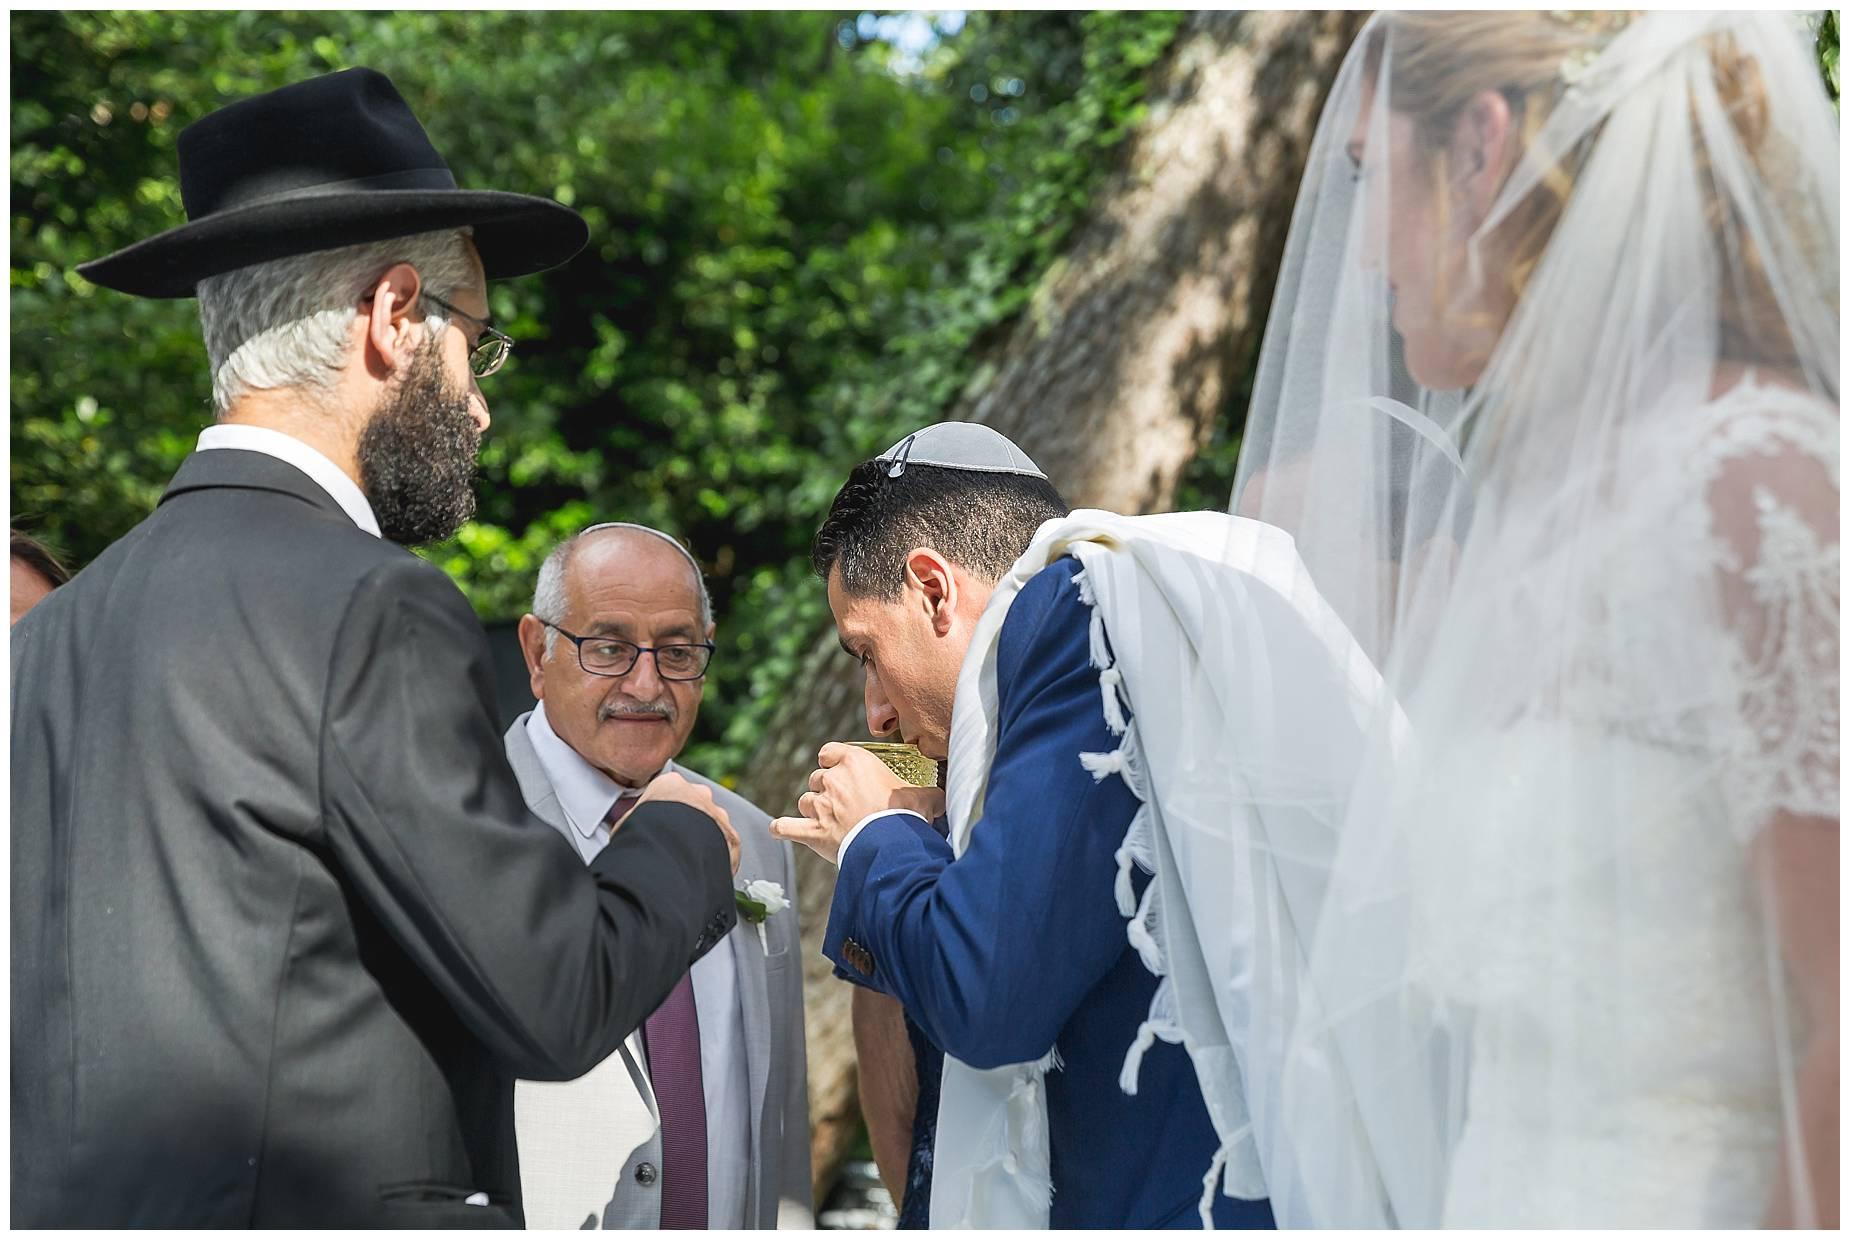 sip of wine in Jewish ceremony